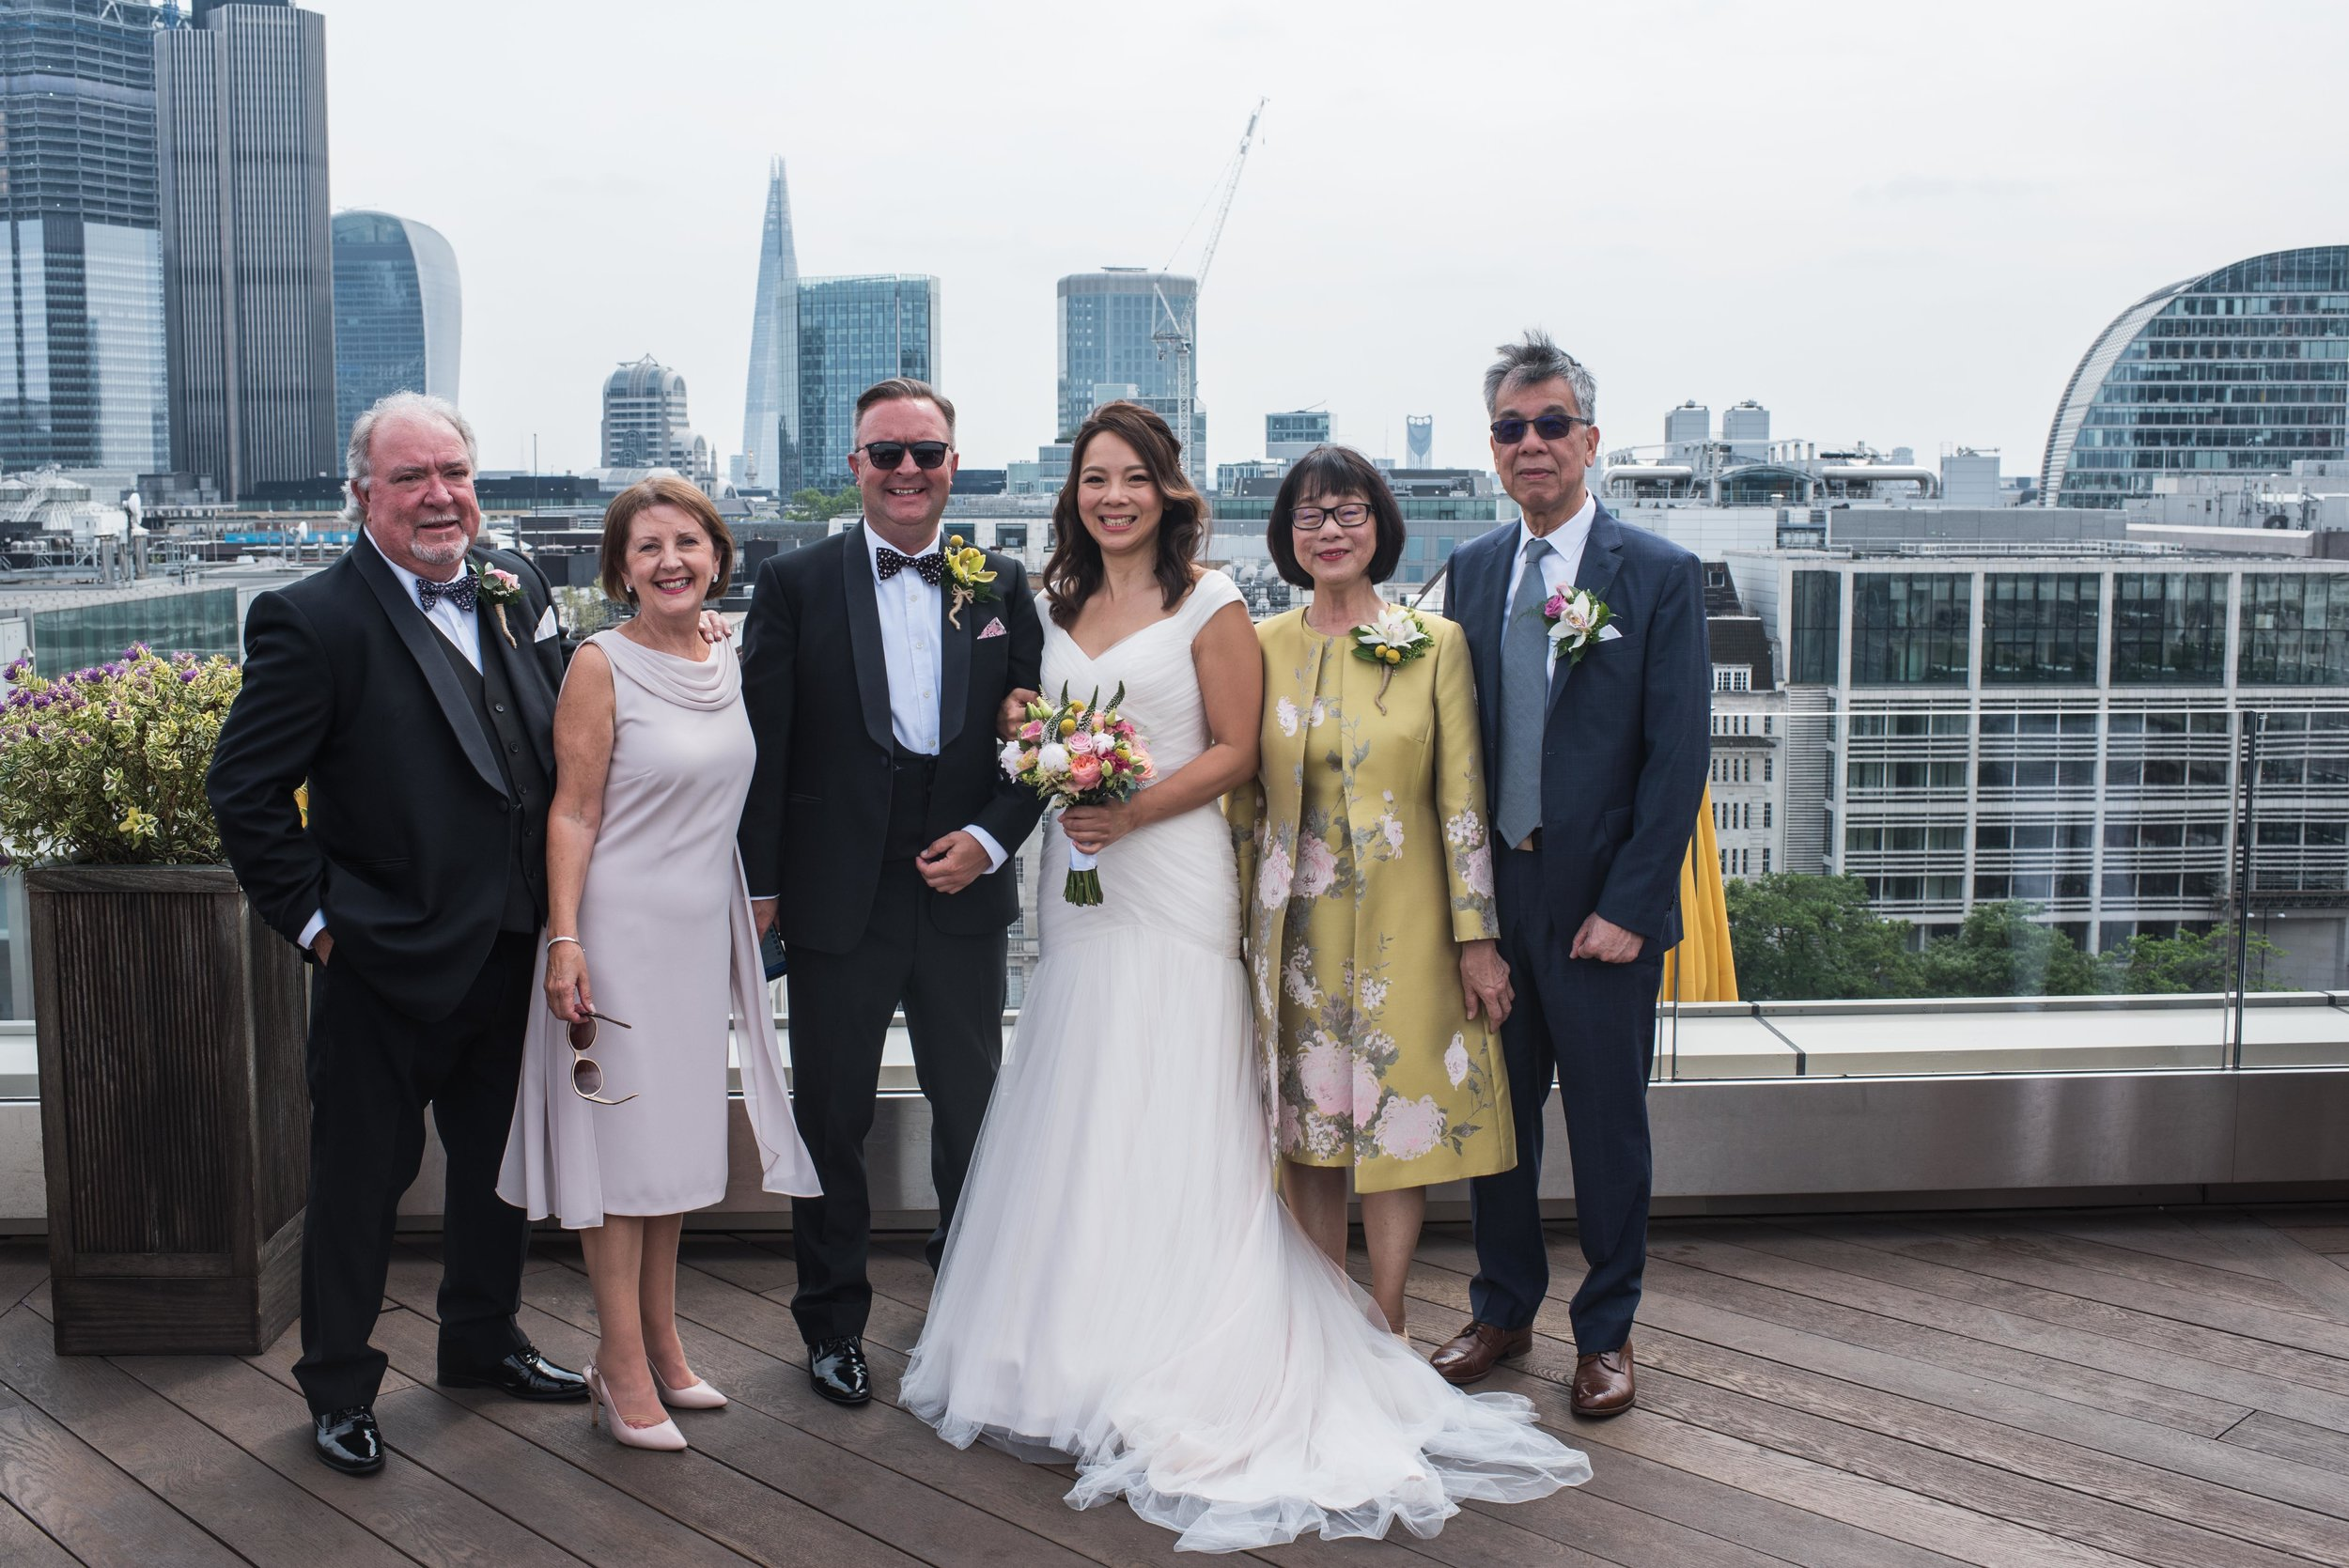 D&M_Marylebone Town Hall Wedding (38 of 239).jpg